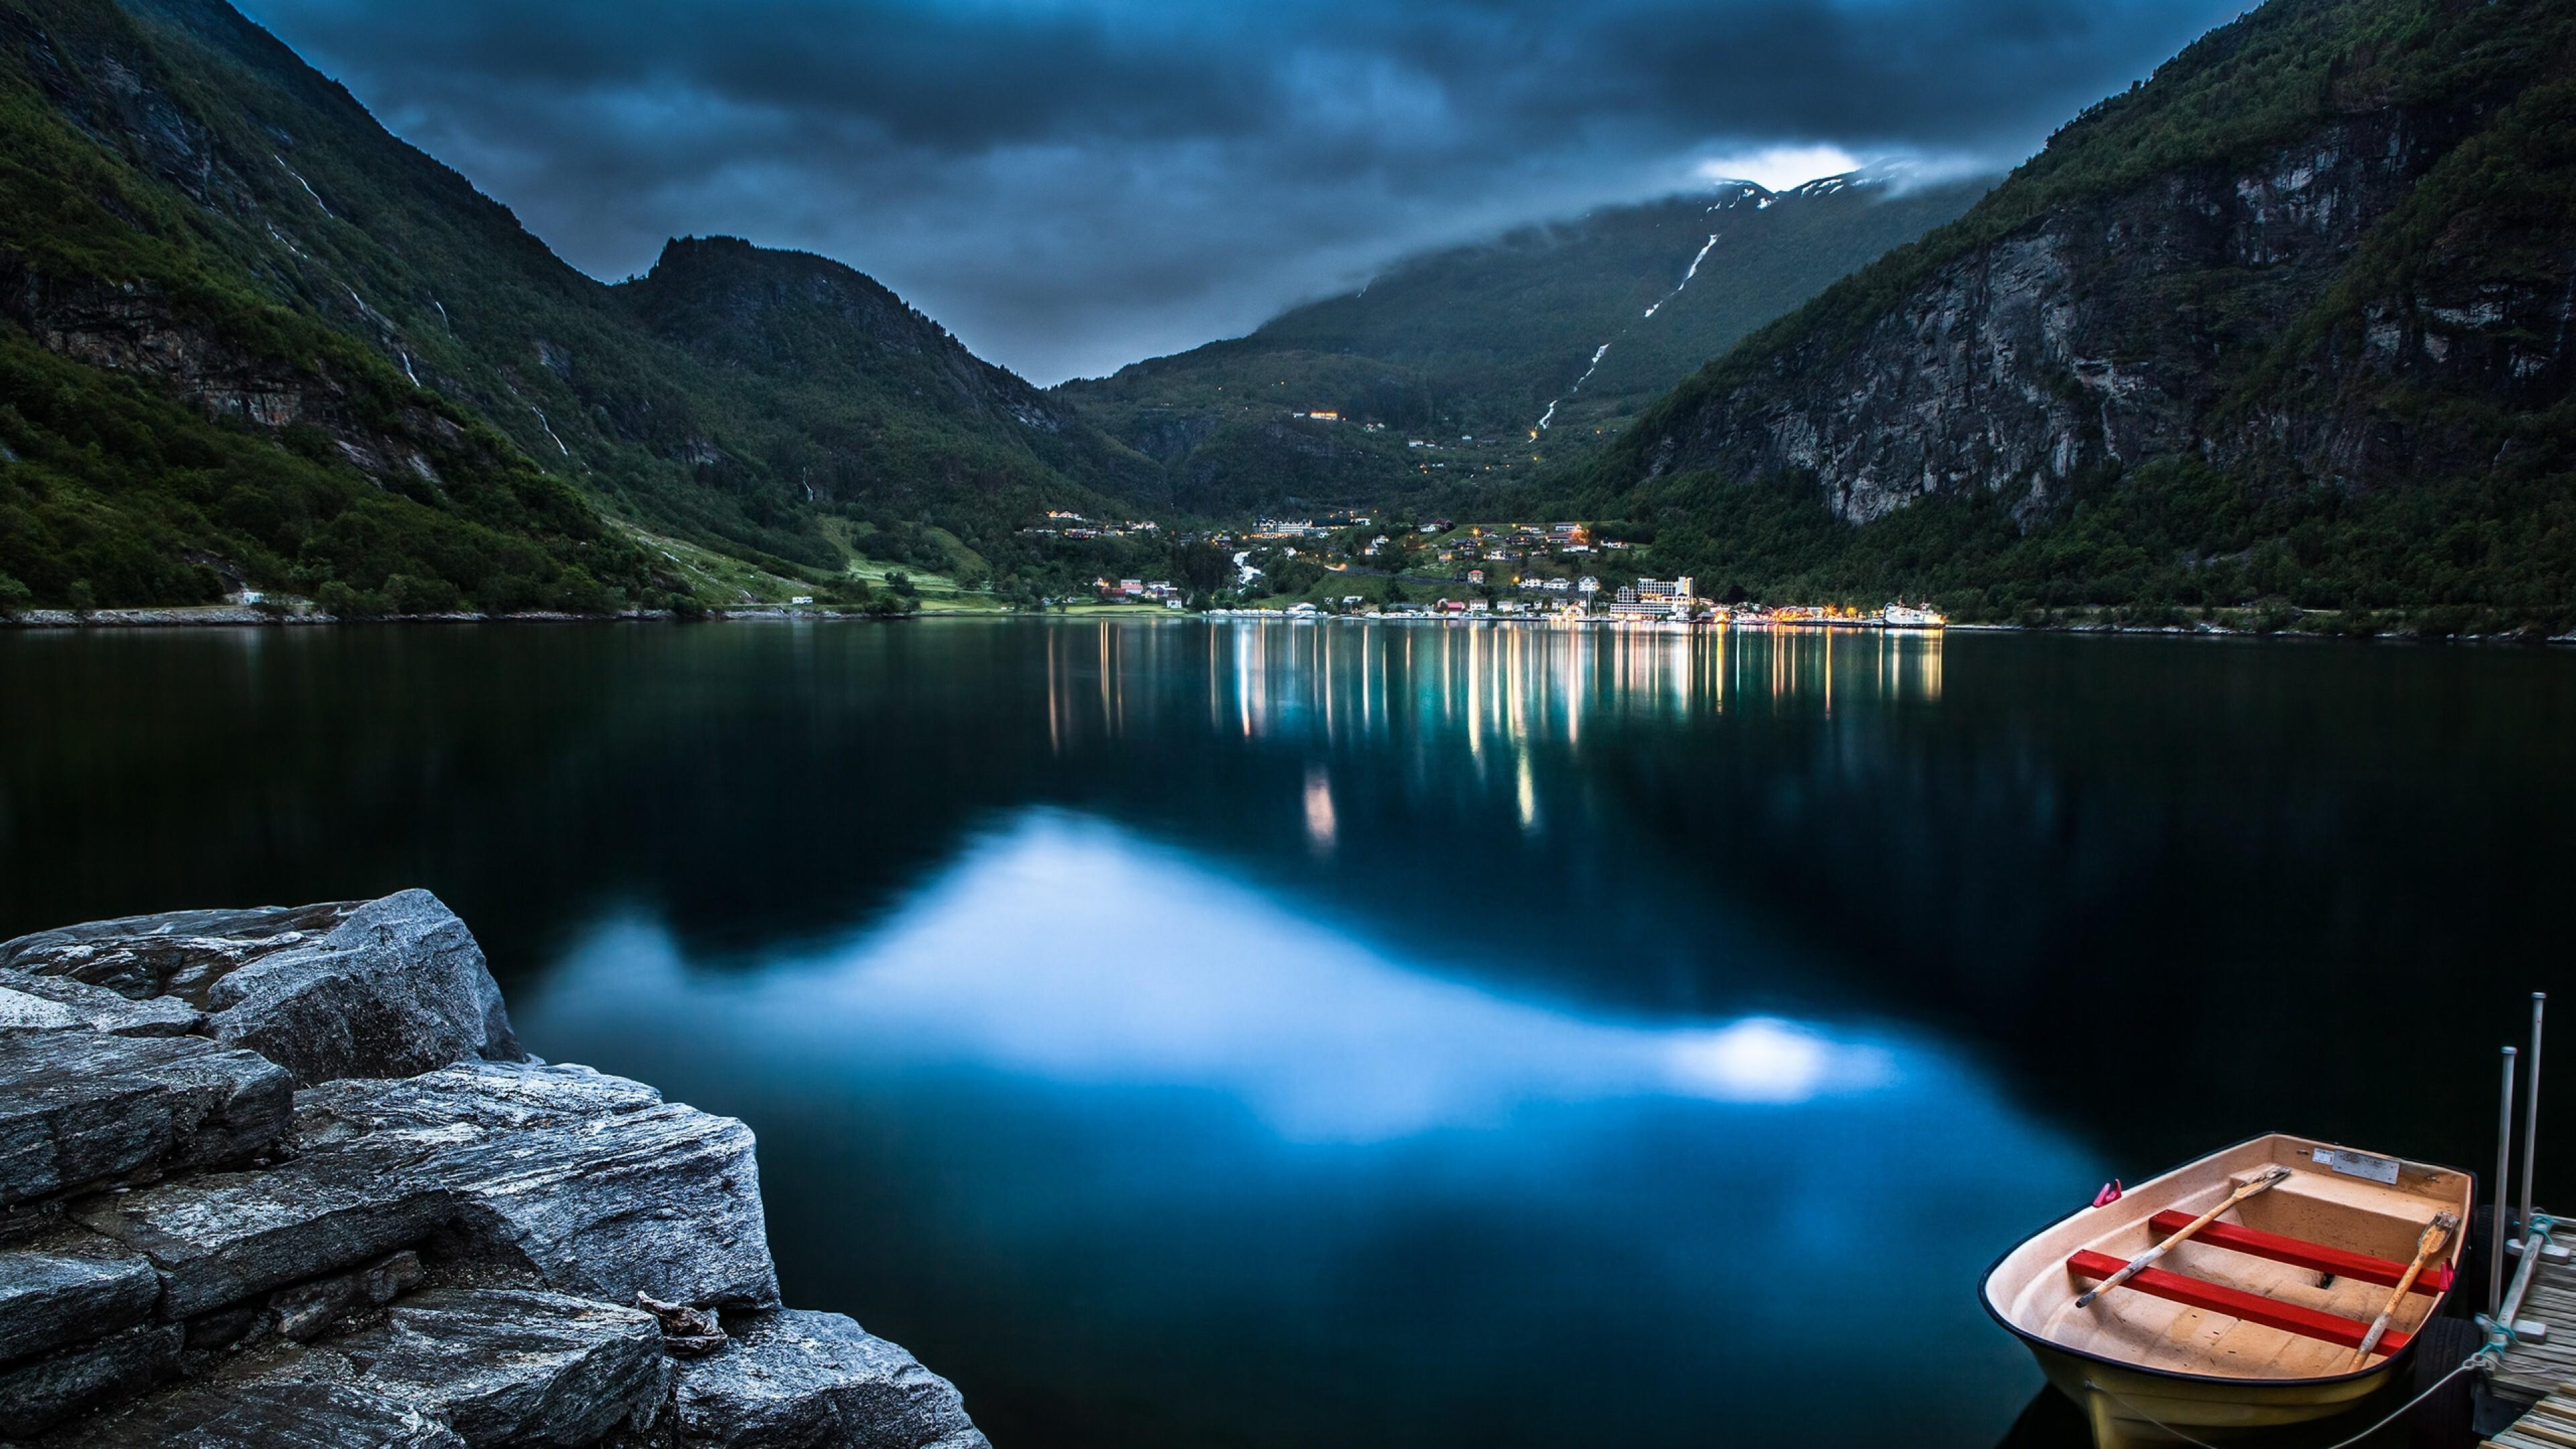 mountain-lake-beautiful-night.jpg